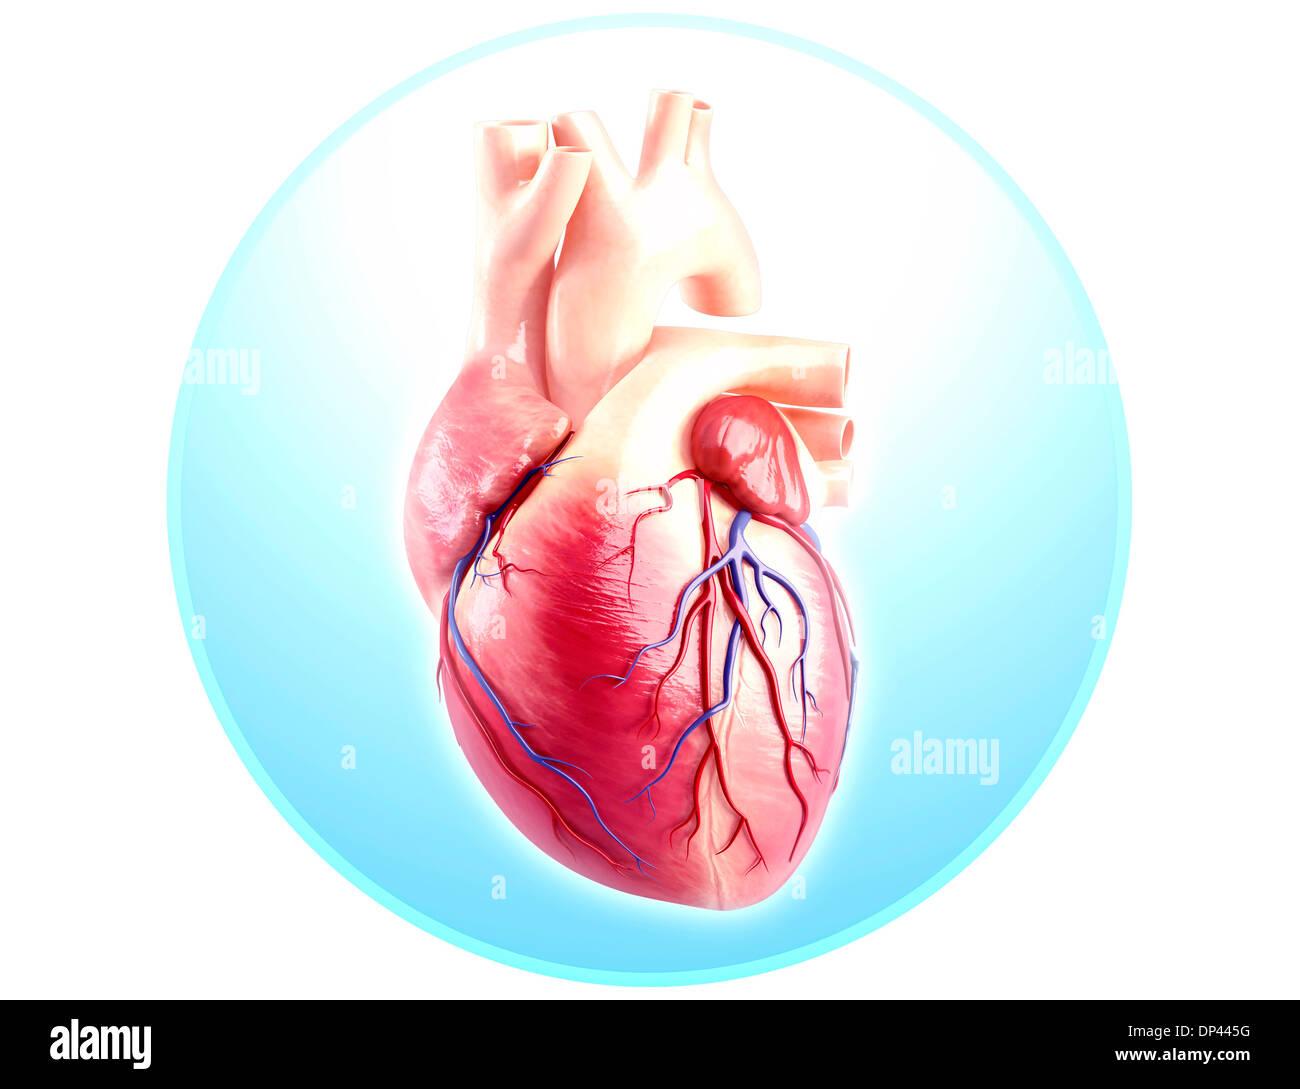 Heart Anatomy Stock Photos Heart Anatomy Stock Images Alamy